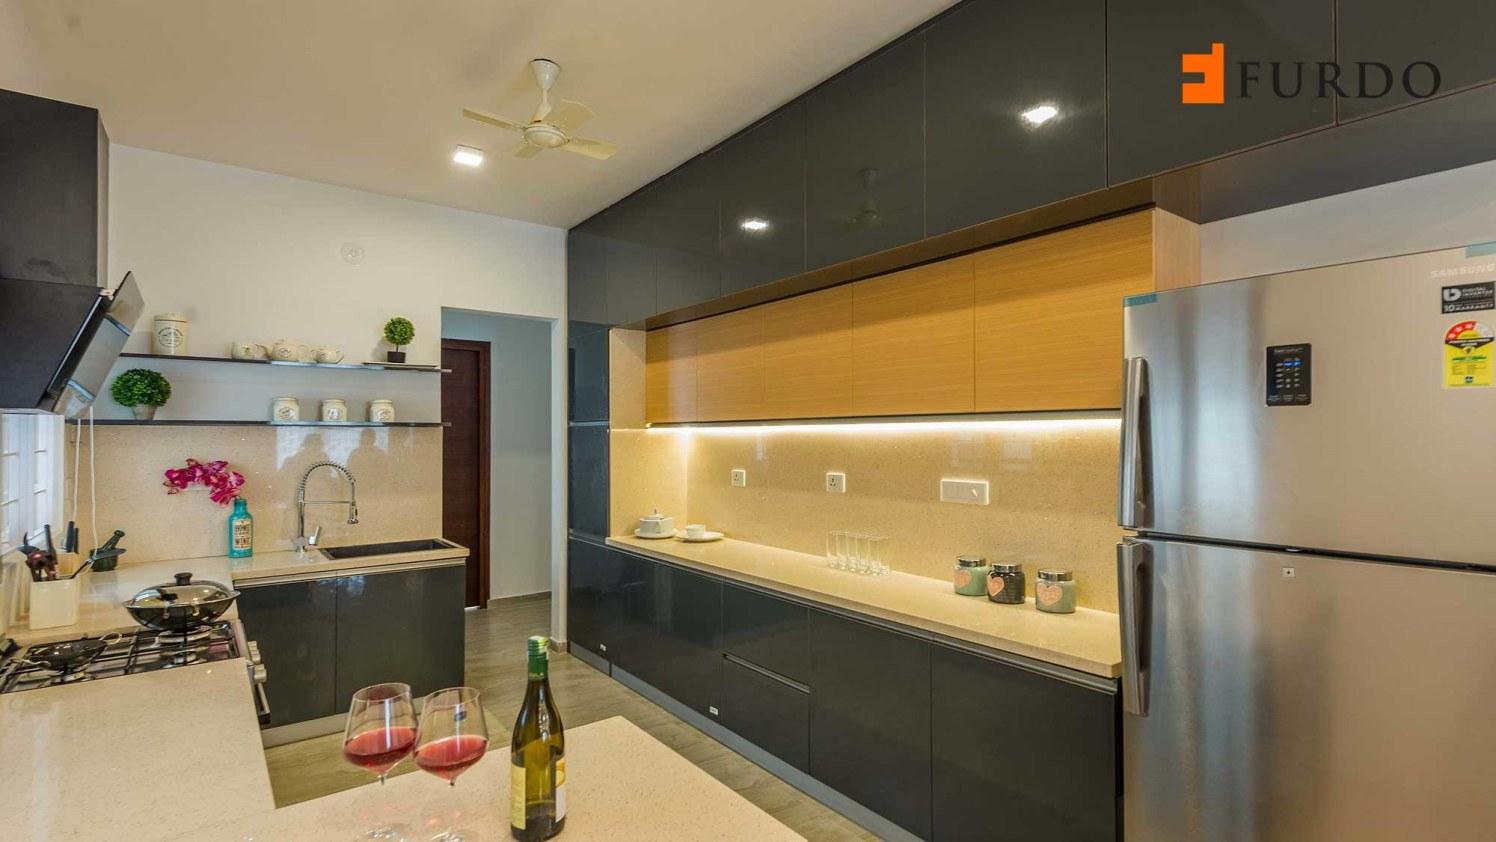 U shape kitchen with wooden flooring and display  unit by Furdo.com Modular-kitchen Modern | Interior Design Photos & Ideas